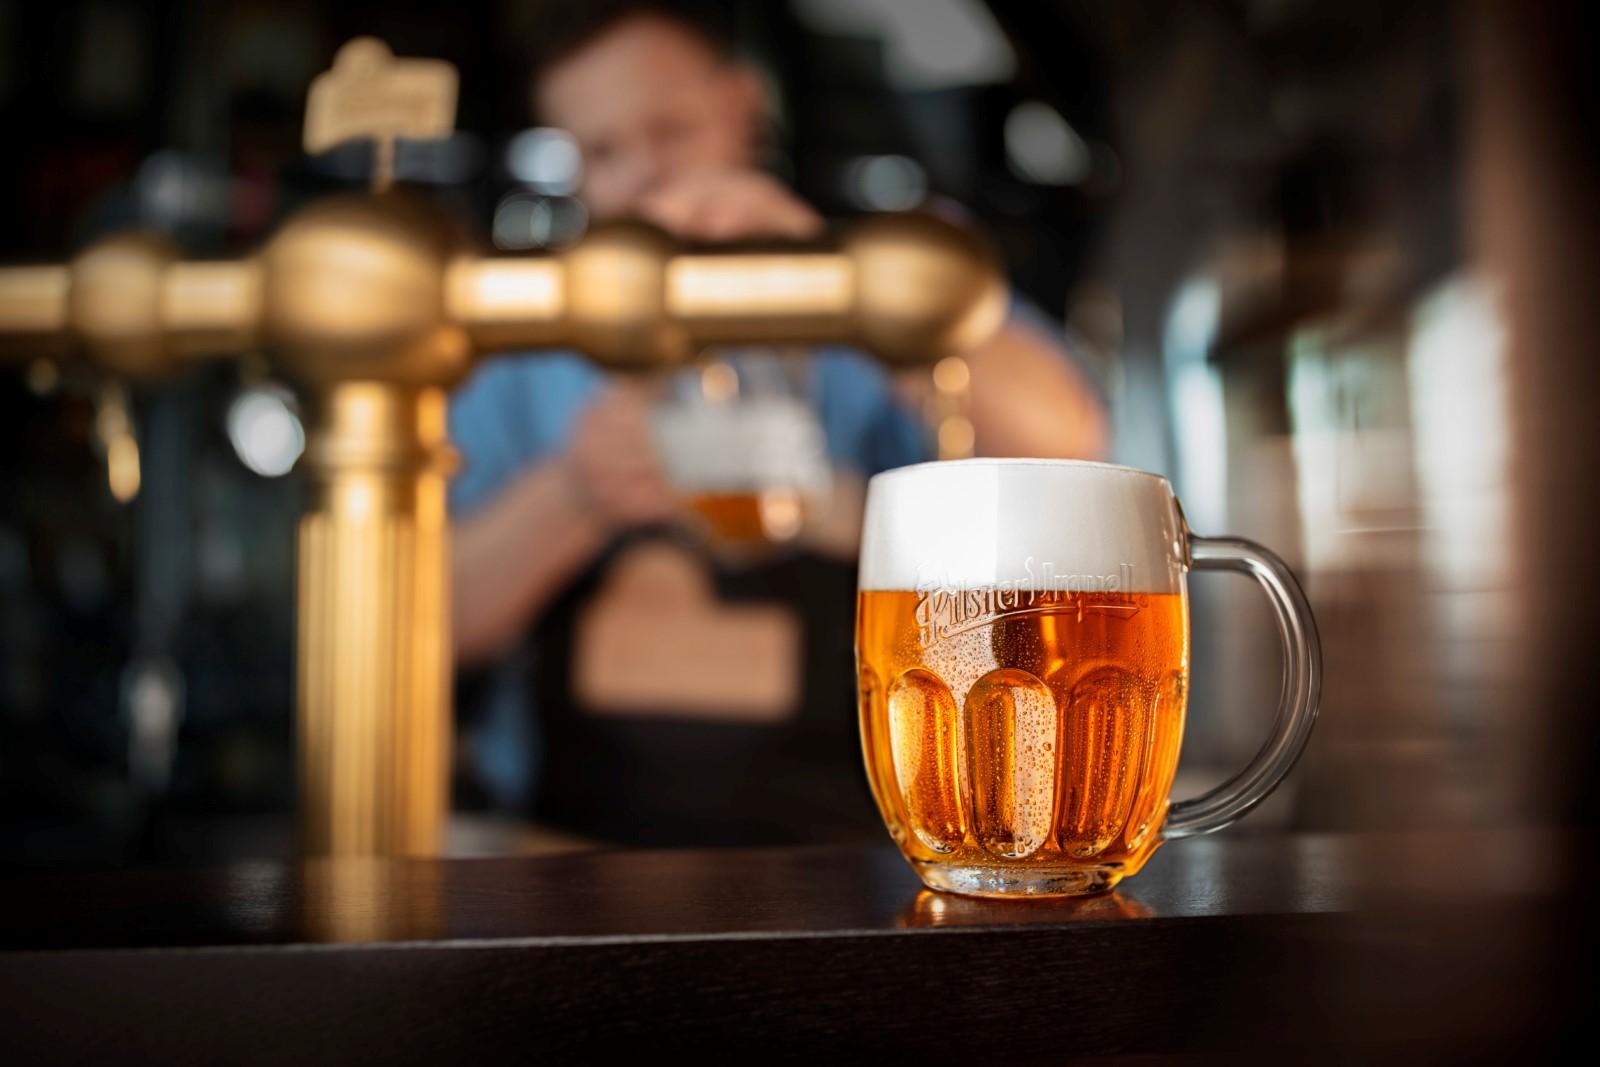 Pomoc hospodám, Plzeňský Prazdroj jim zdarma vymění veškeré prošlé pivo za čerstvé